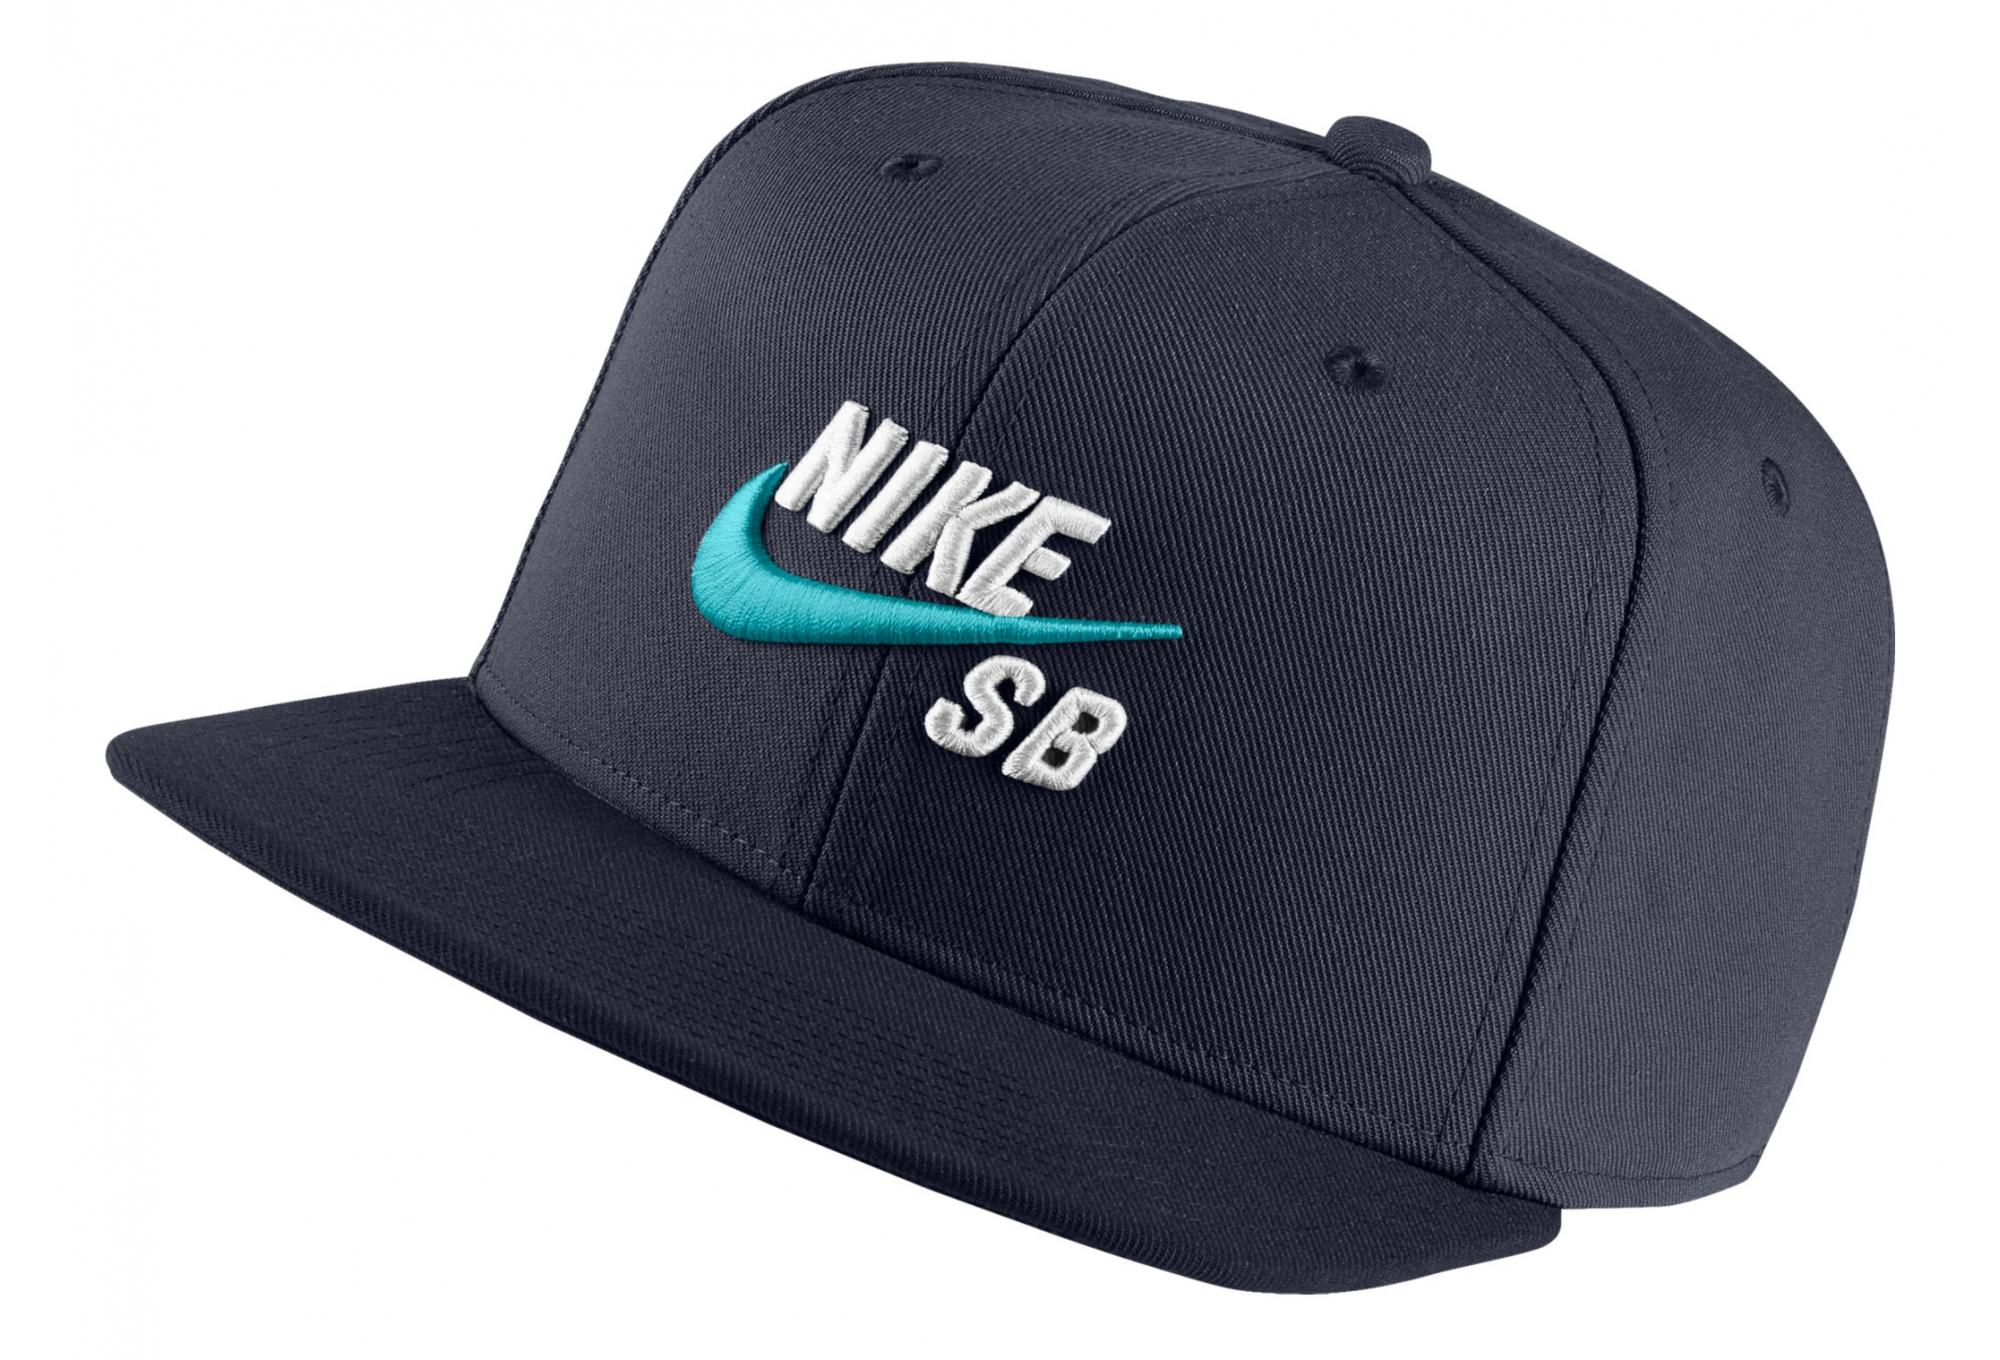 Casquette Nike SB Icon Gris Anthracite